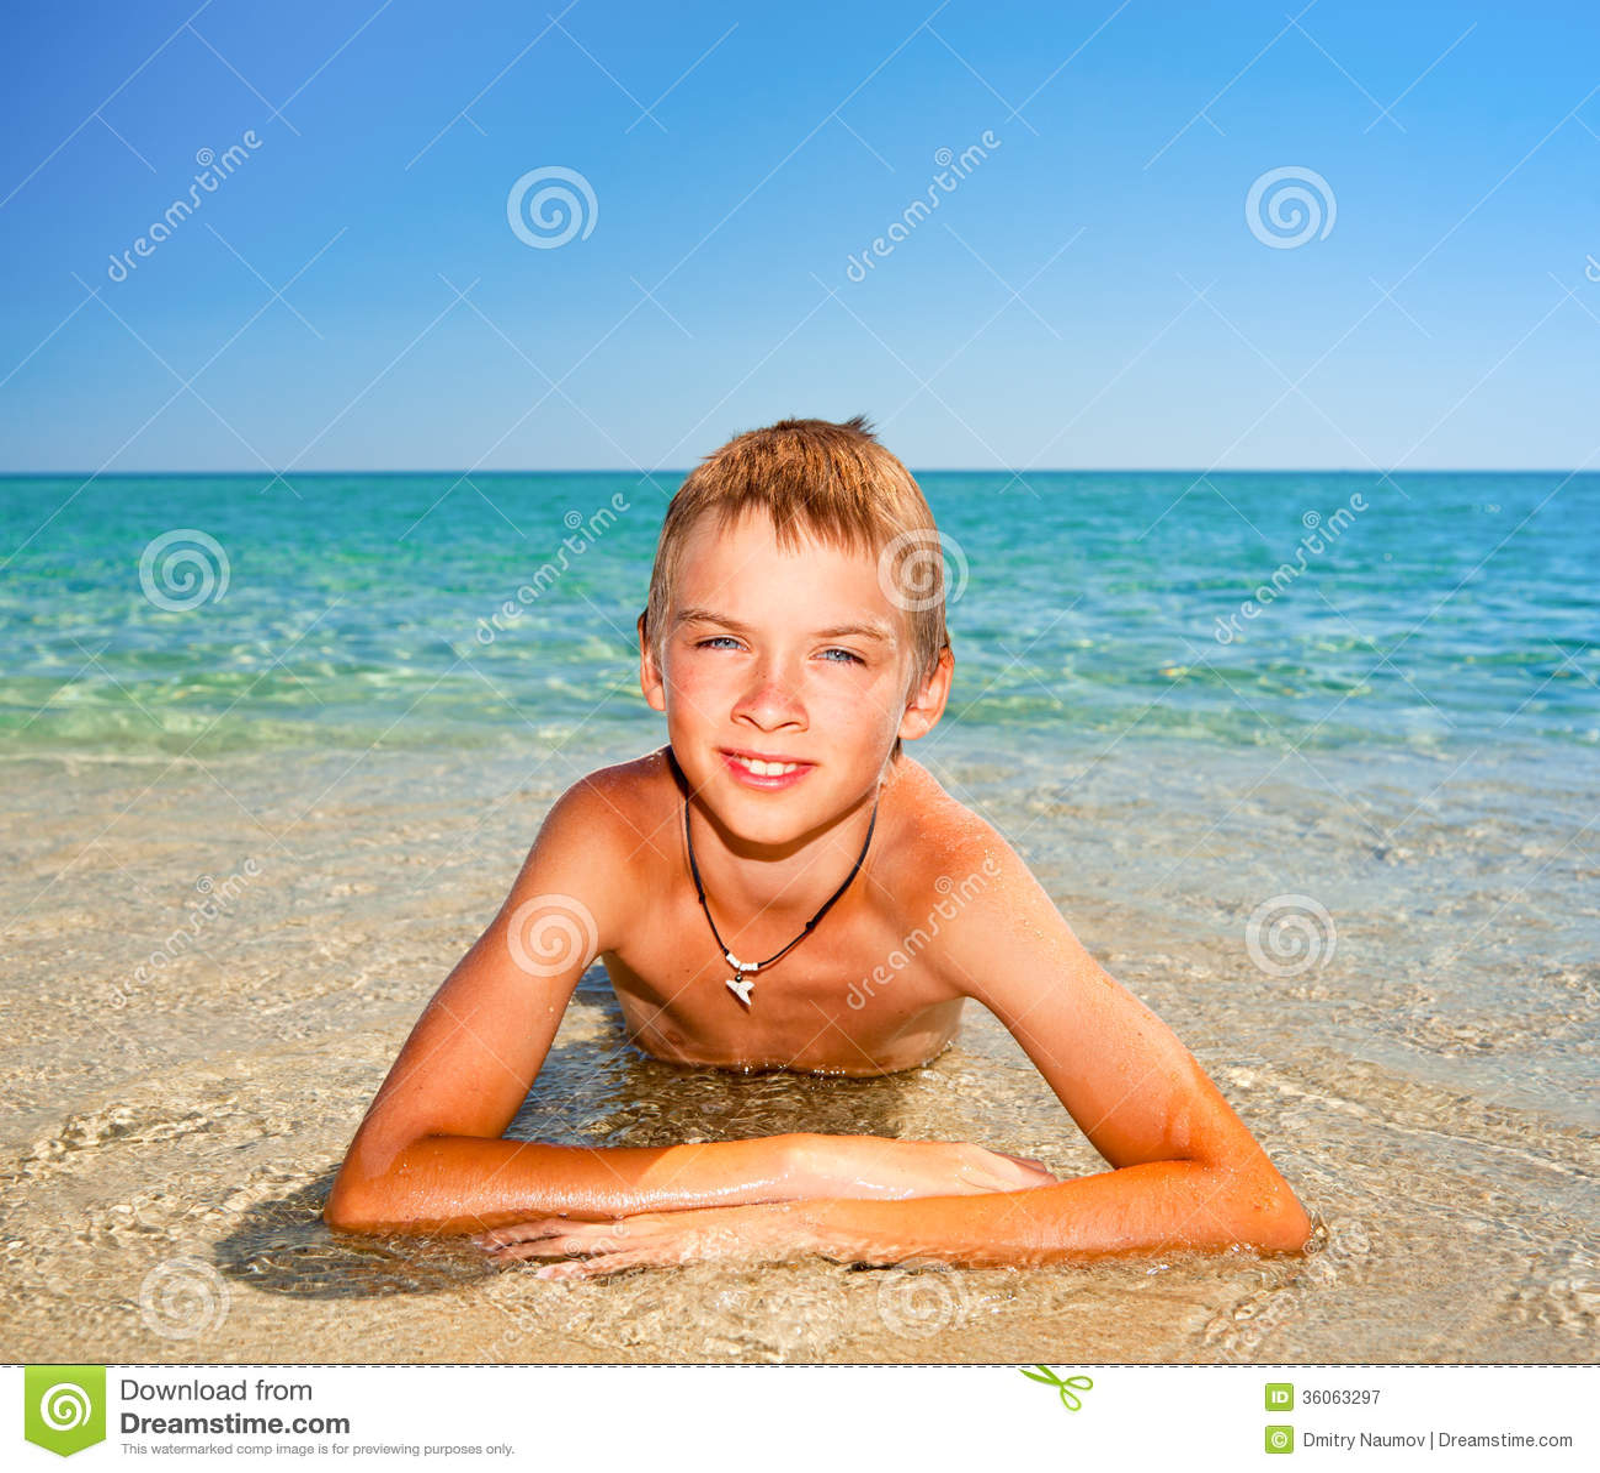 Boys nudist beach film xxx movies